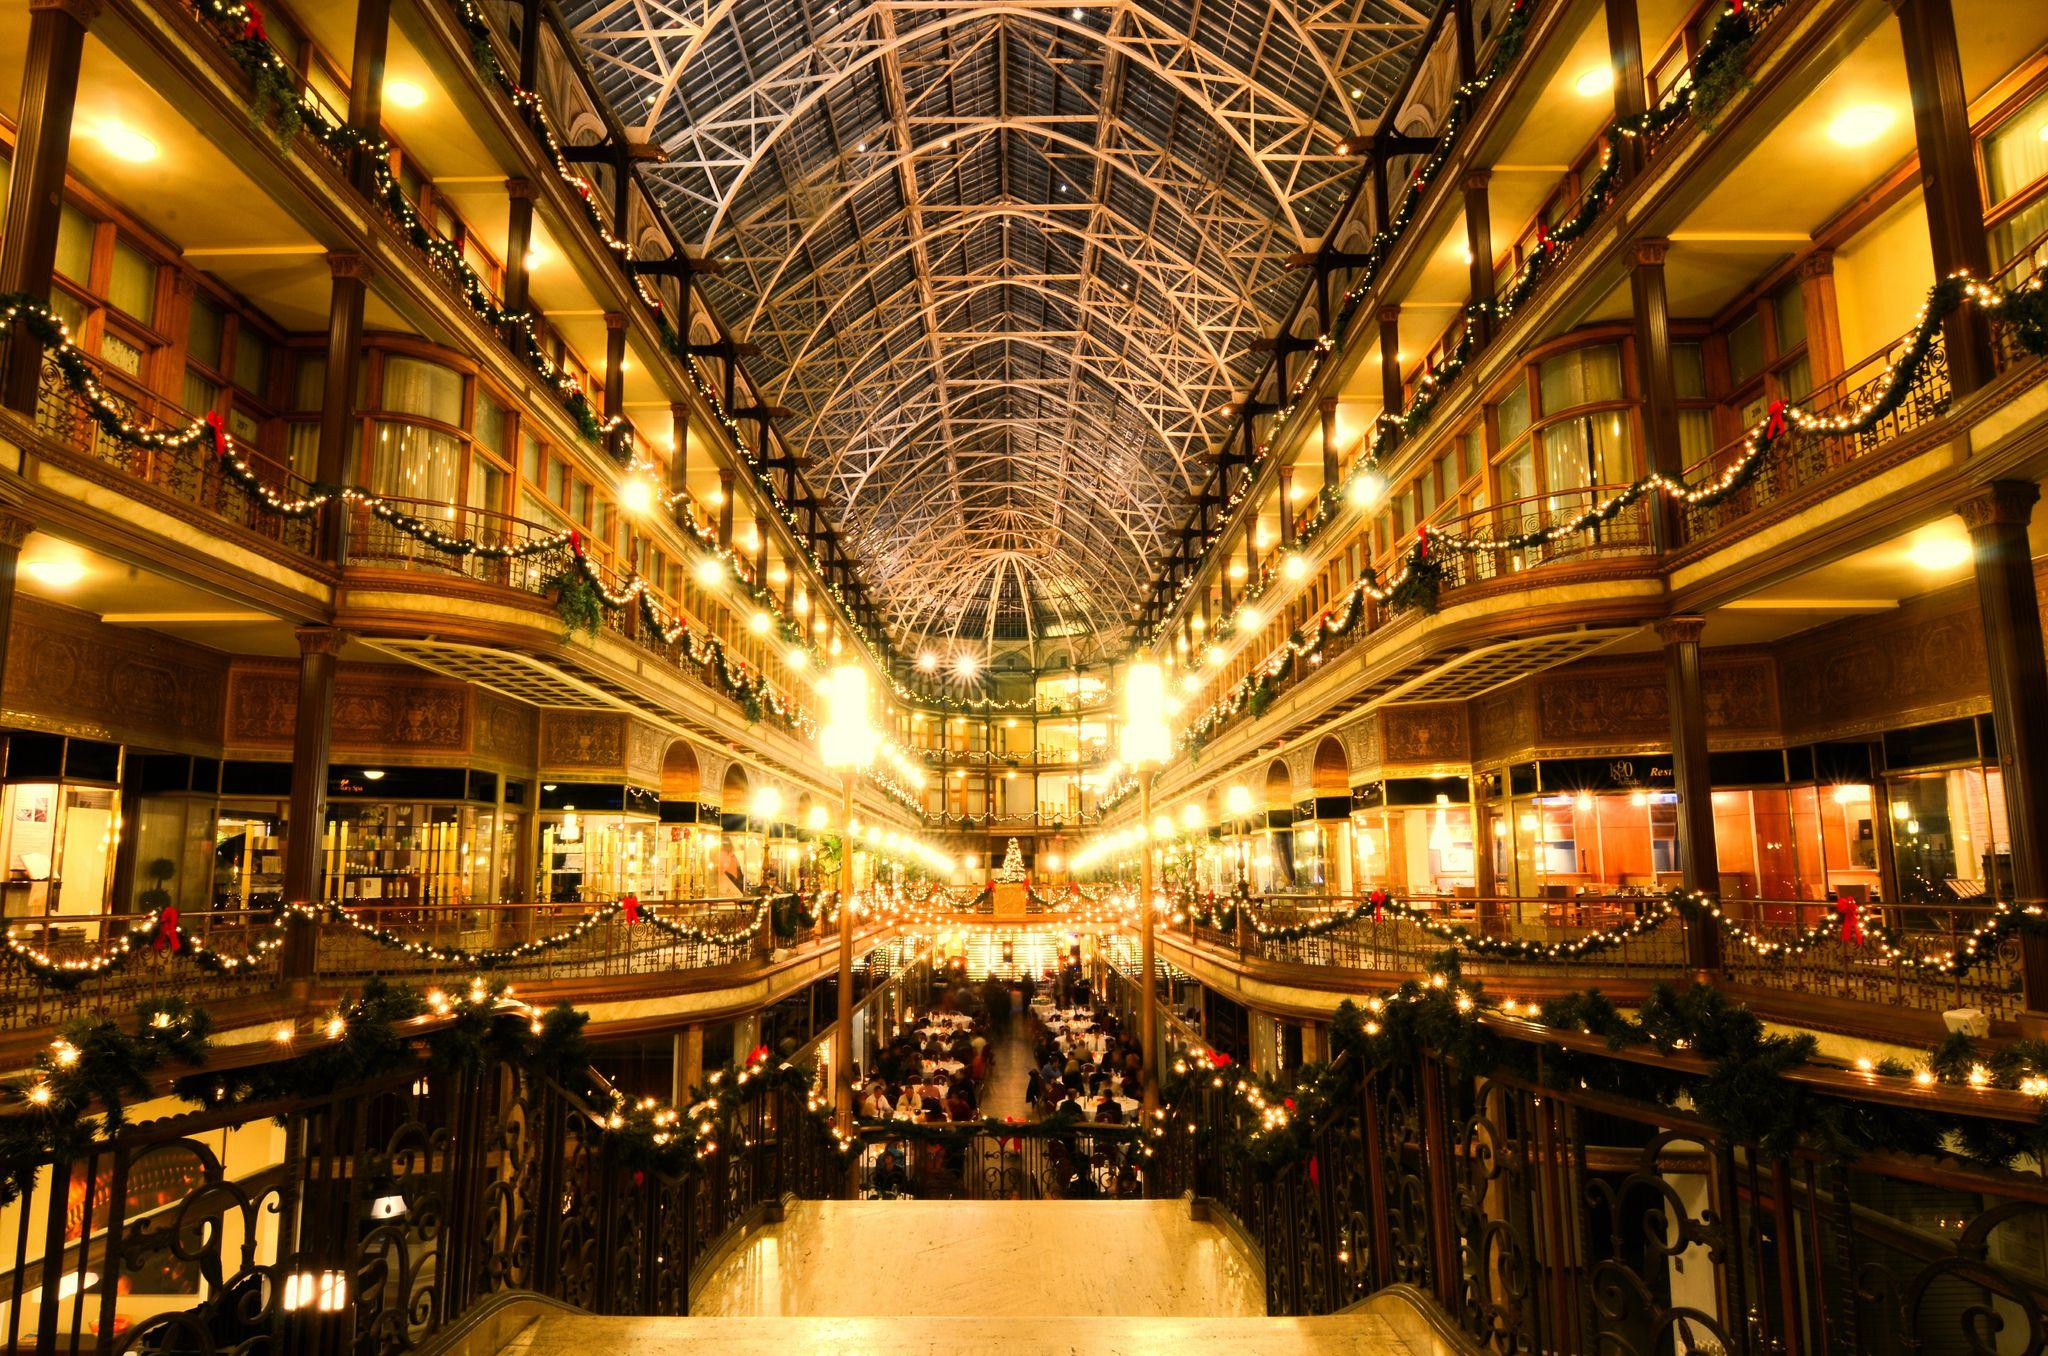 Visit Cleveland's Arcade